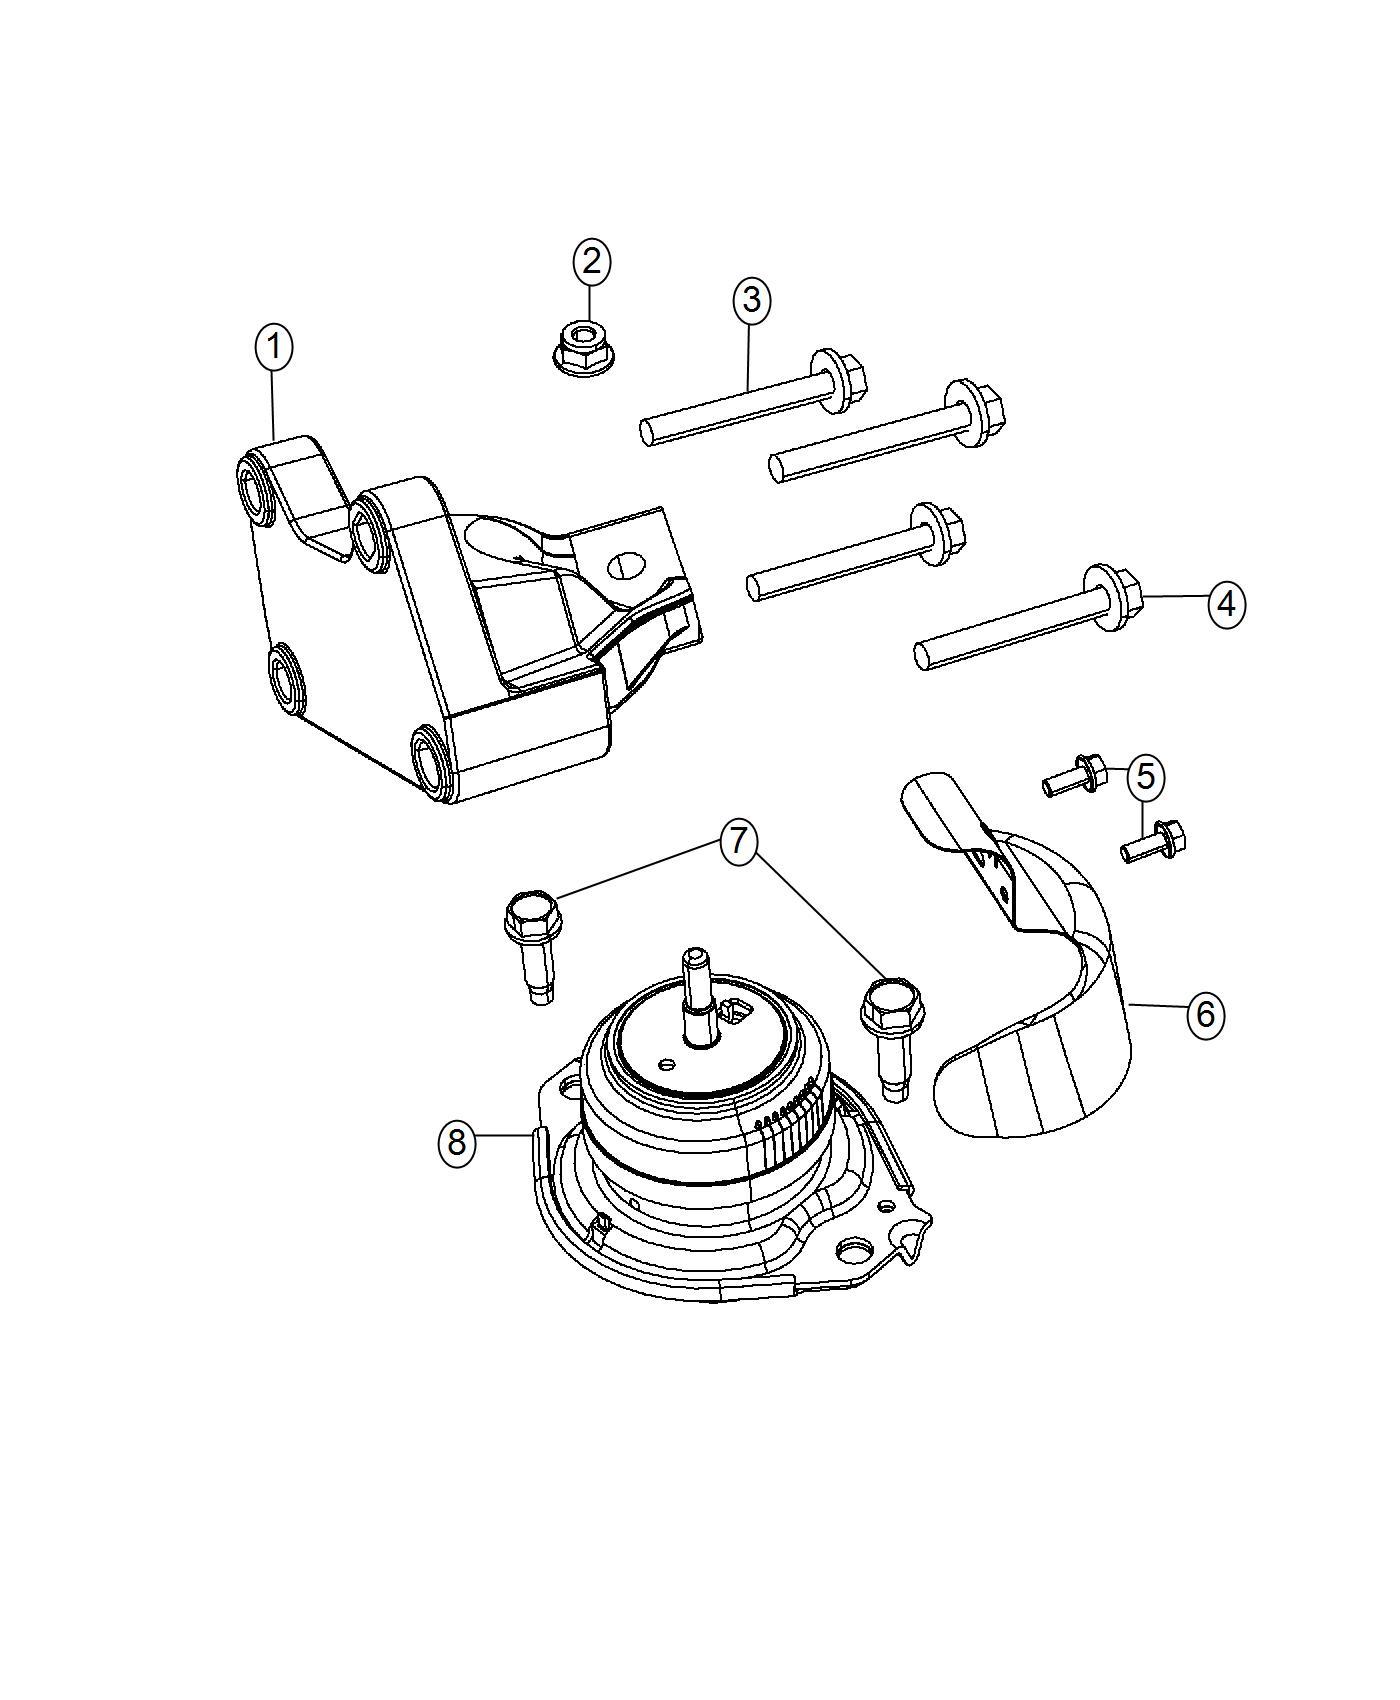 Jeep Grand Cherokee Heat Shield  Engine Mount  Right Side